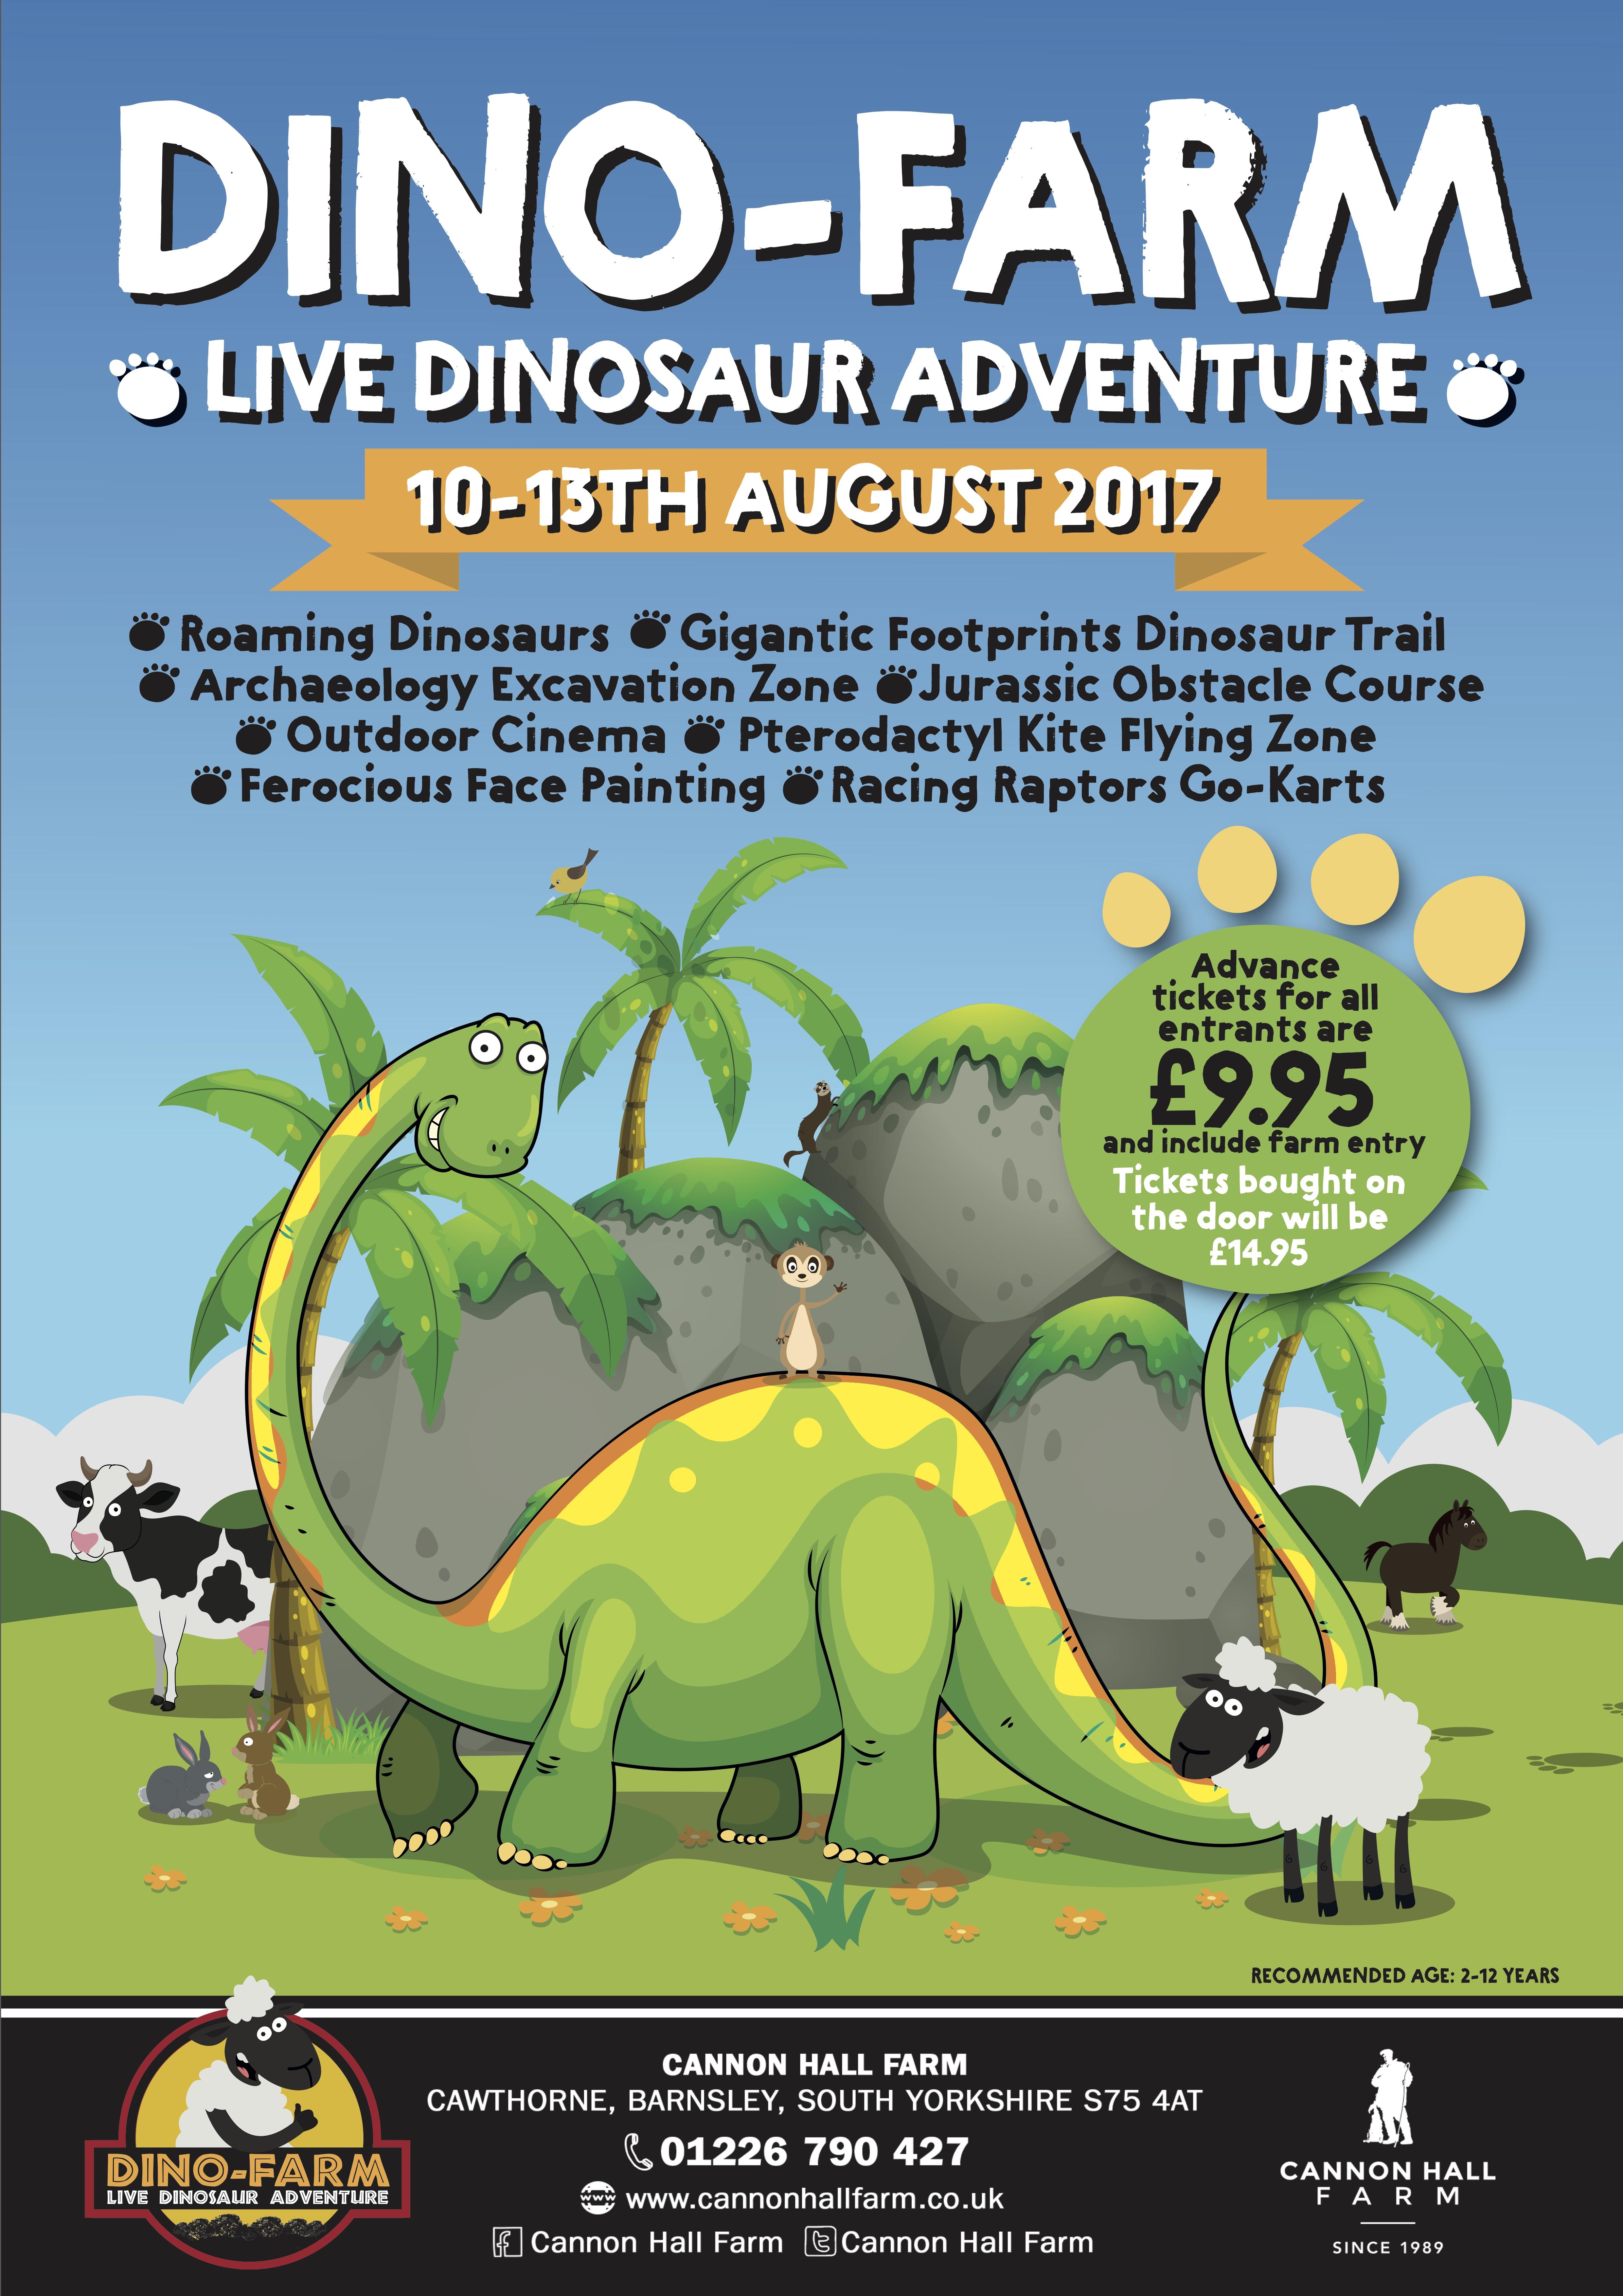 Dino Farm